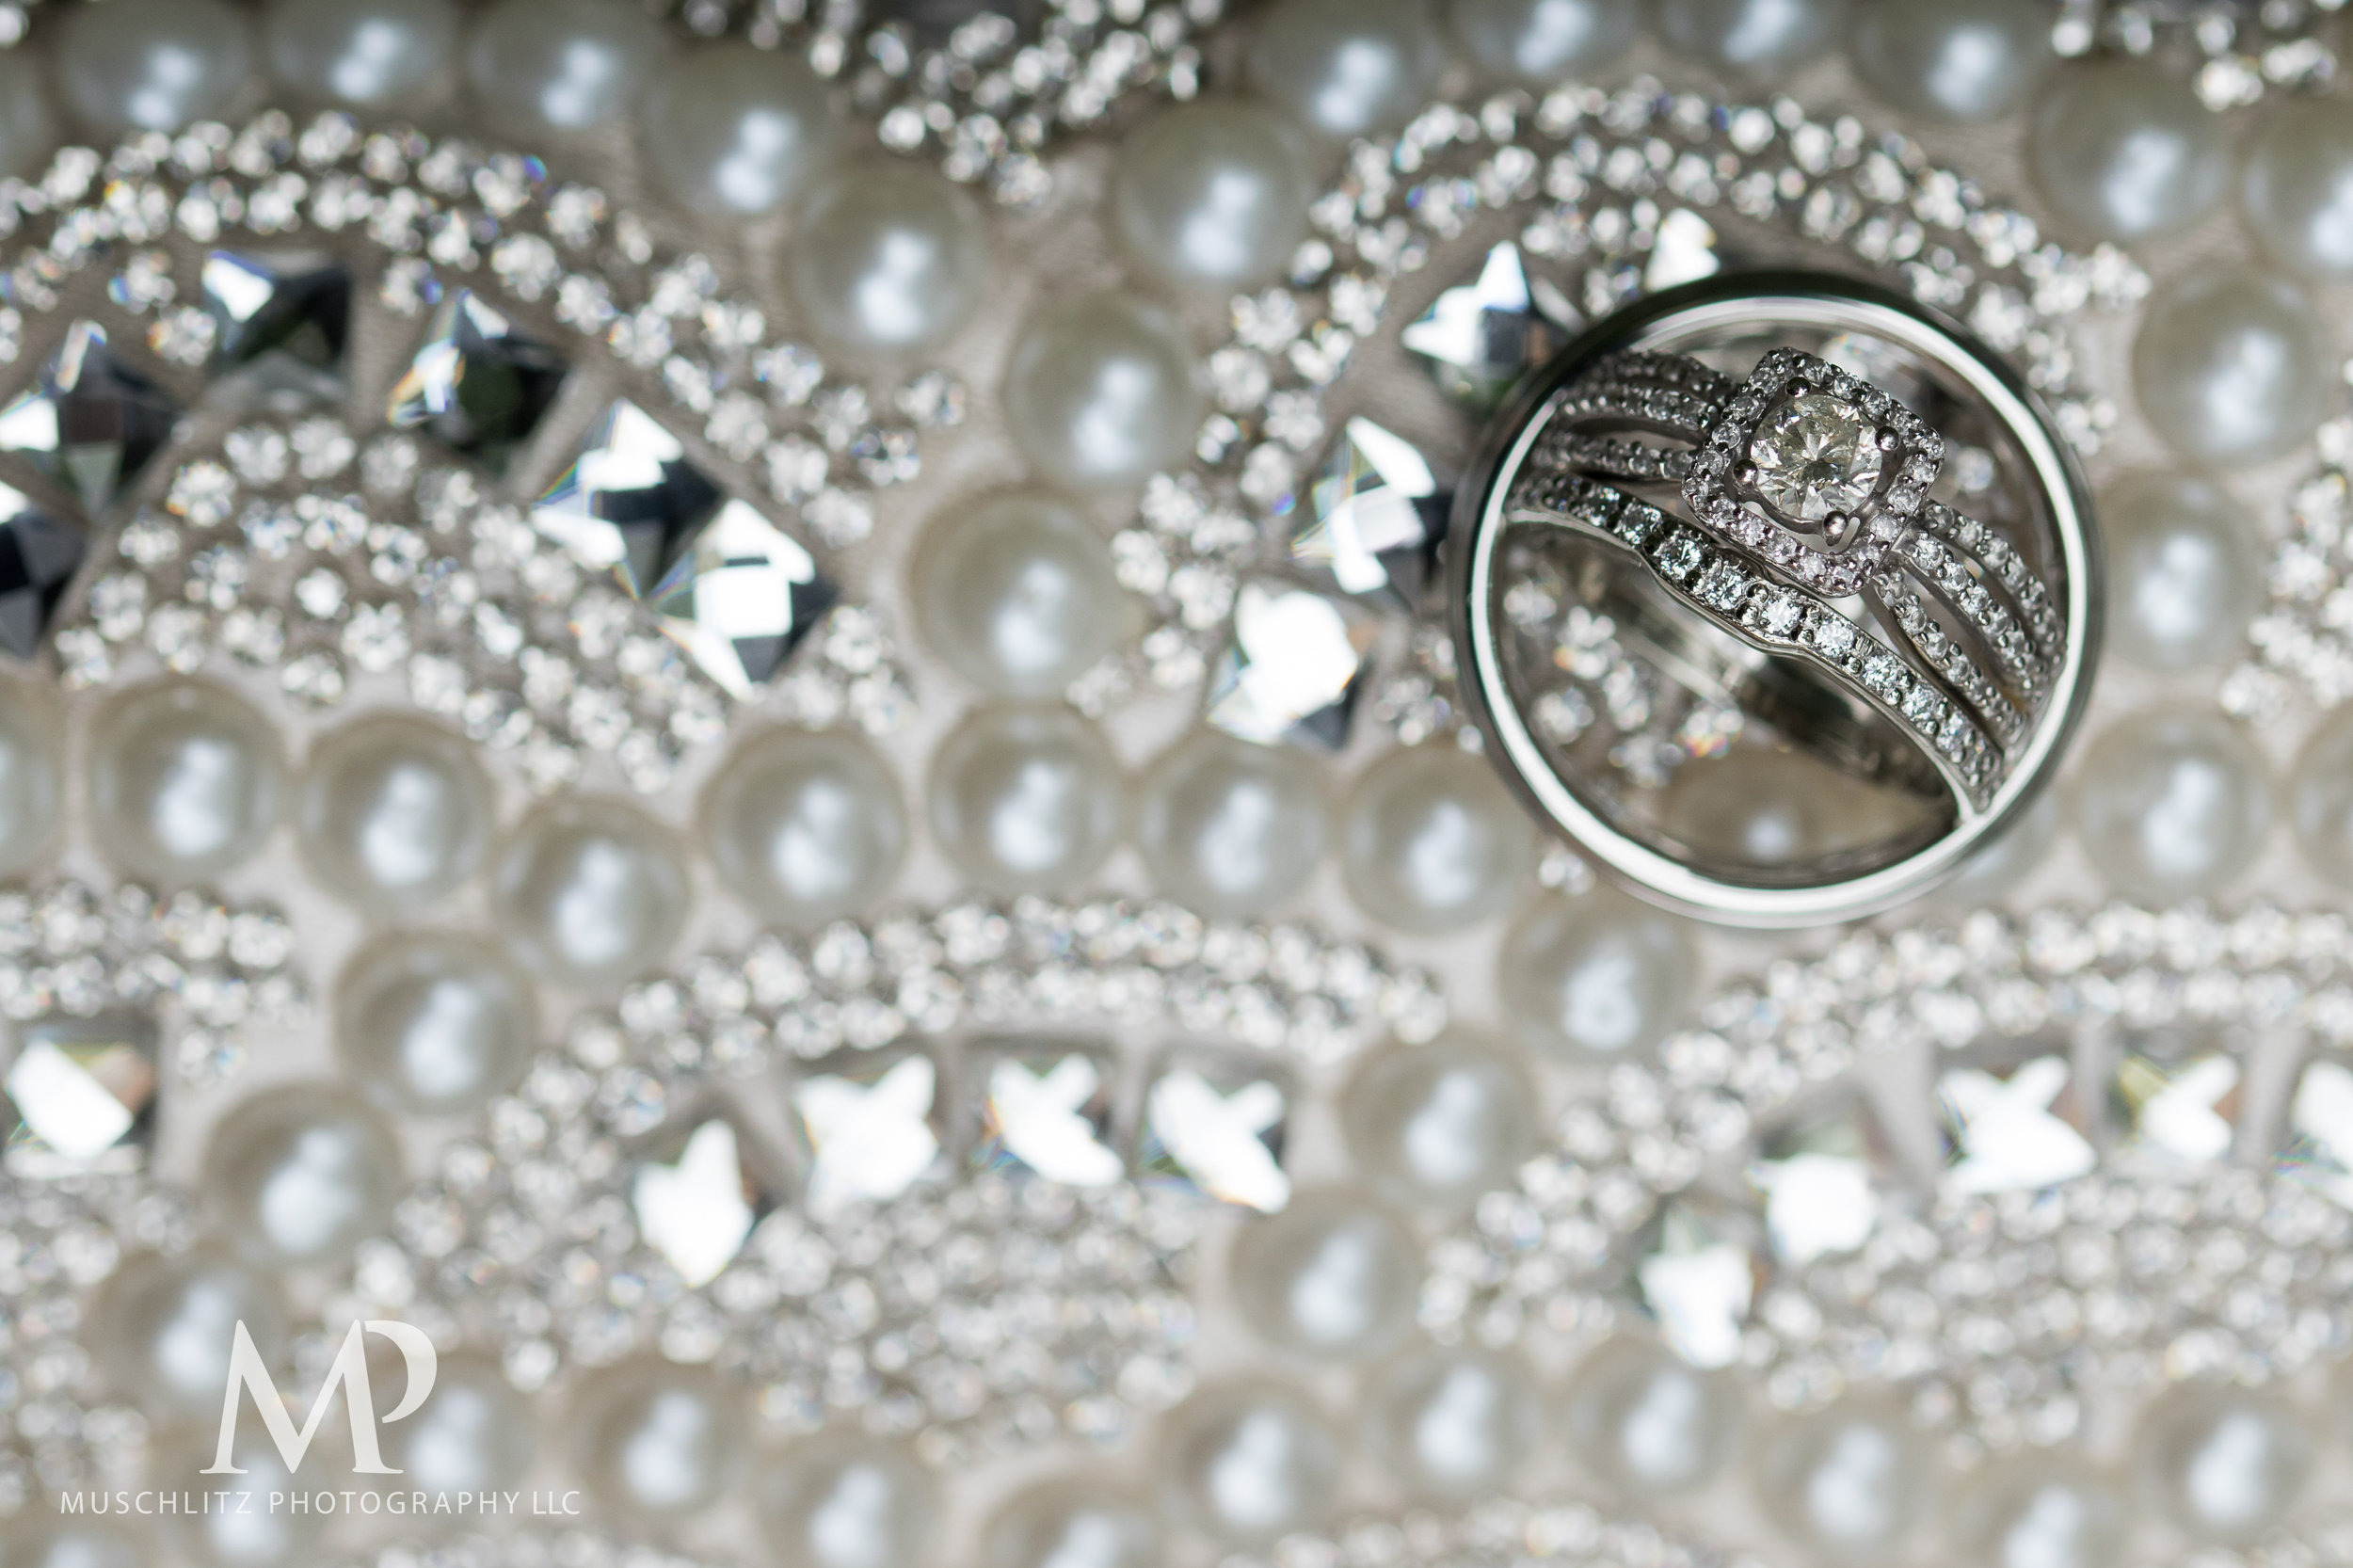 club-at-corazon-wedding-ceremony-reception-columbus-dublin-ohio-ohio-university-theme-008.JPG